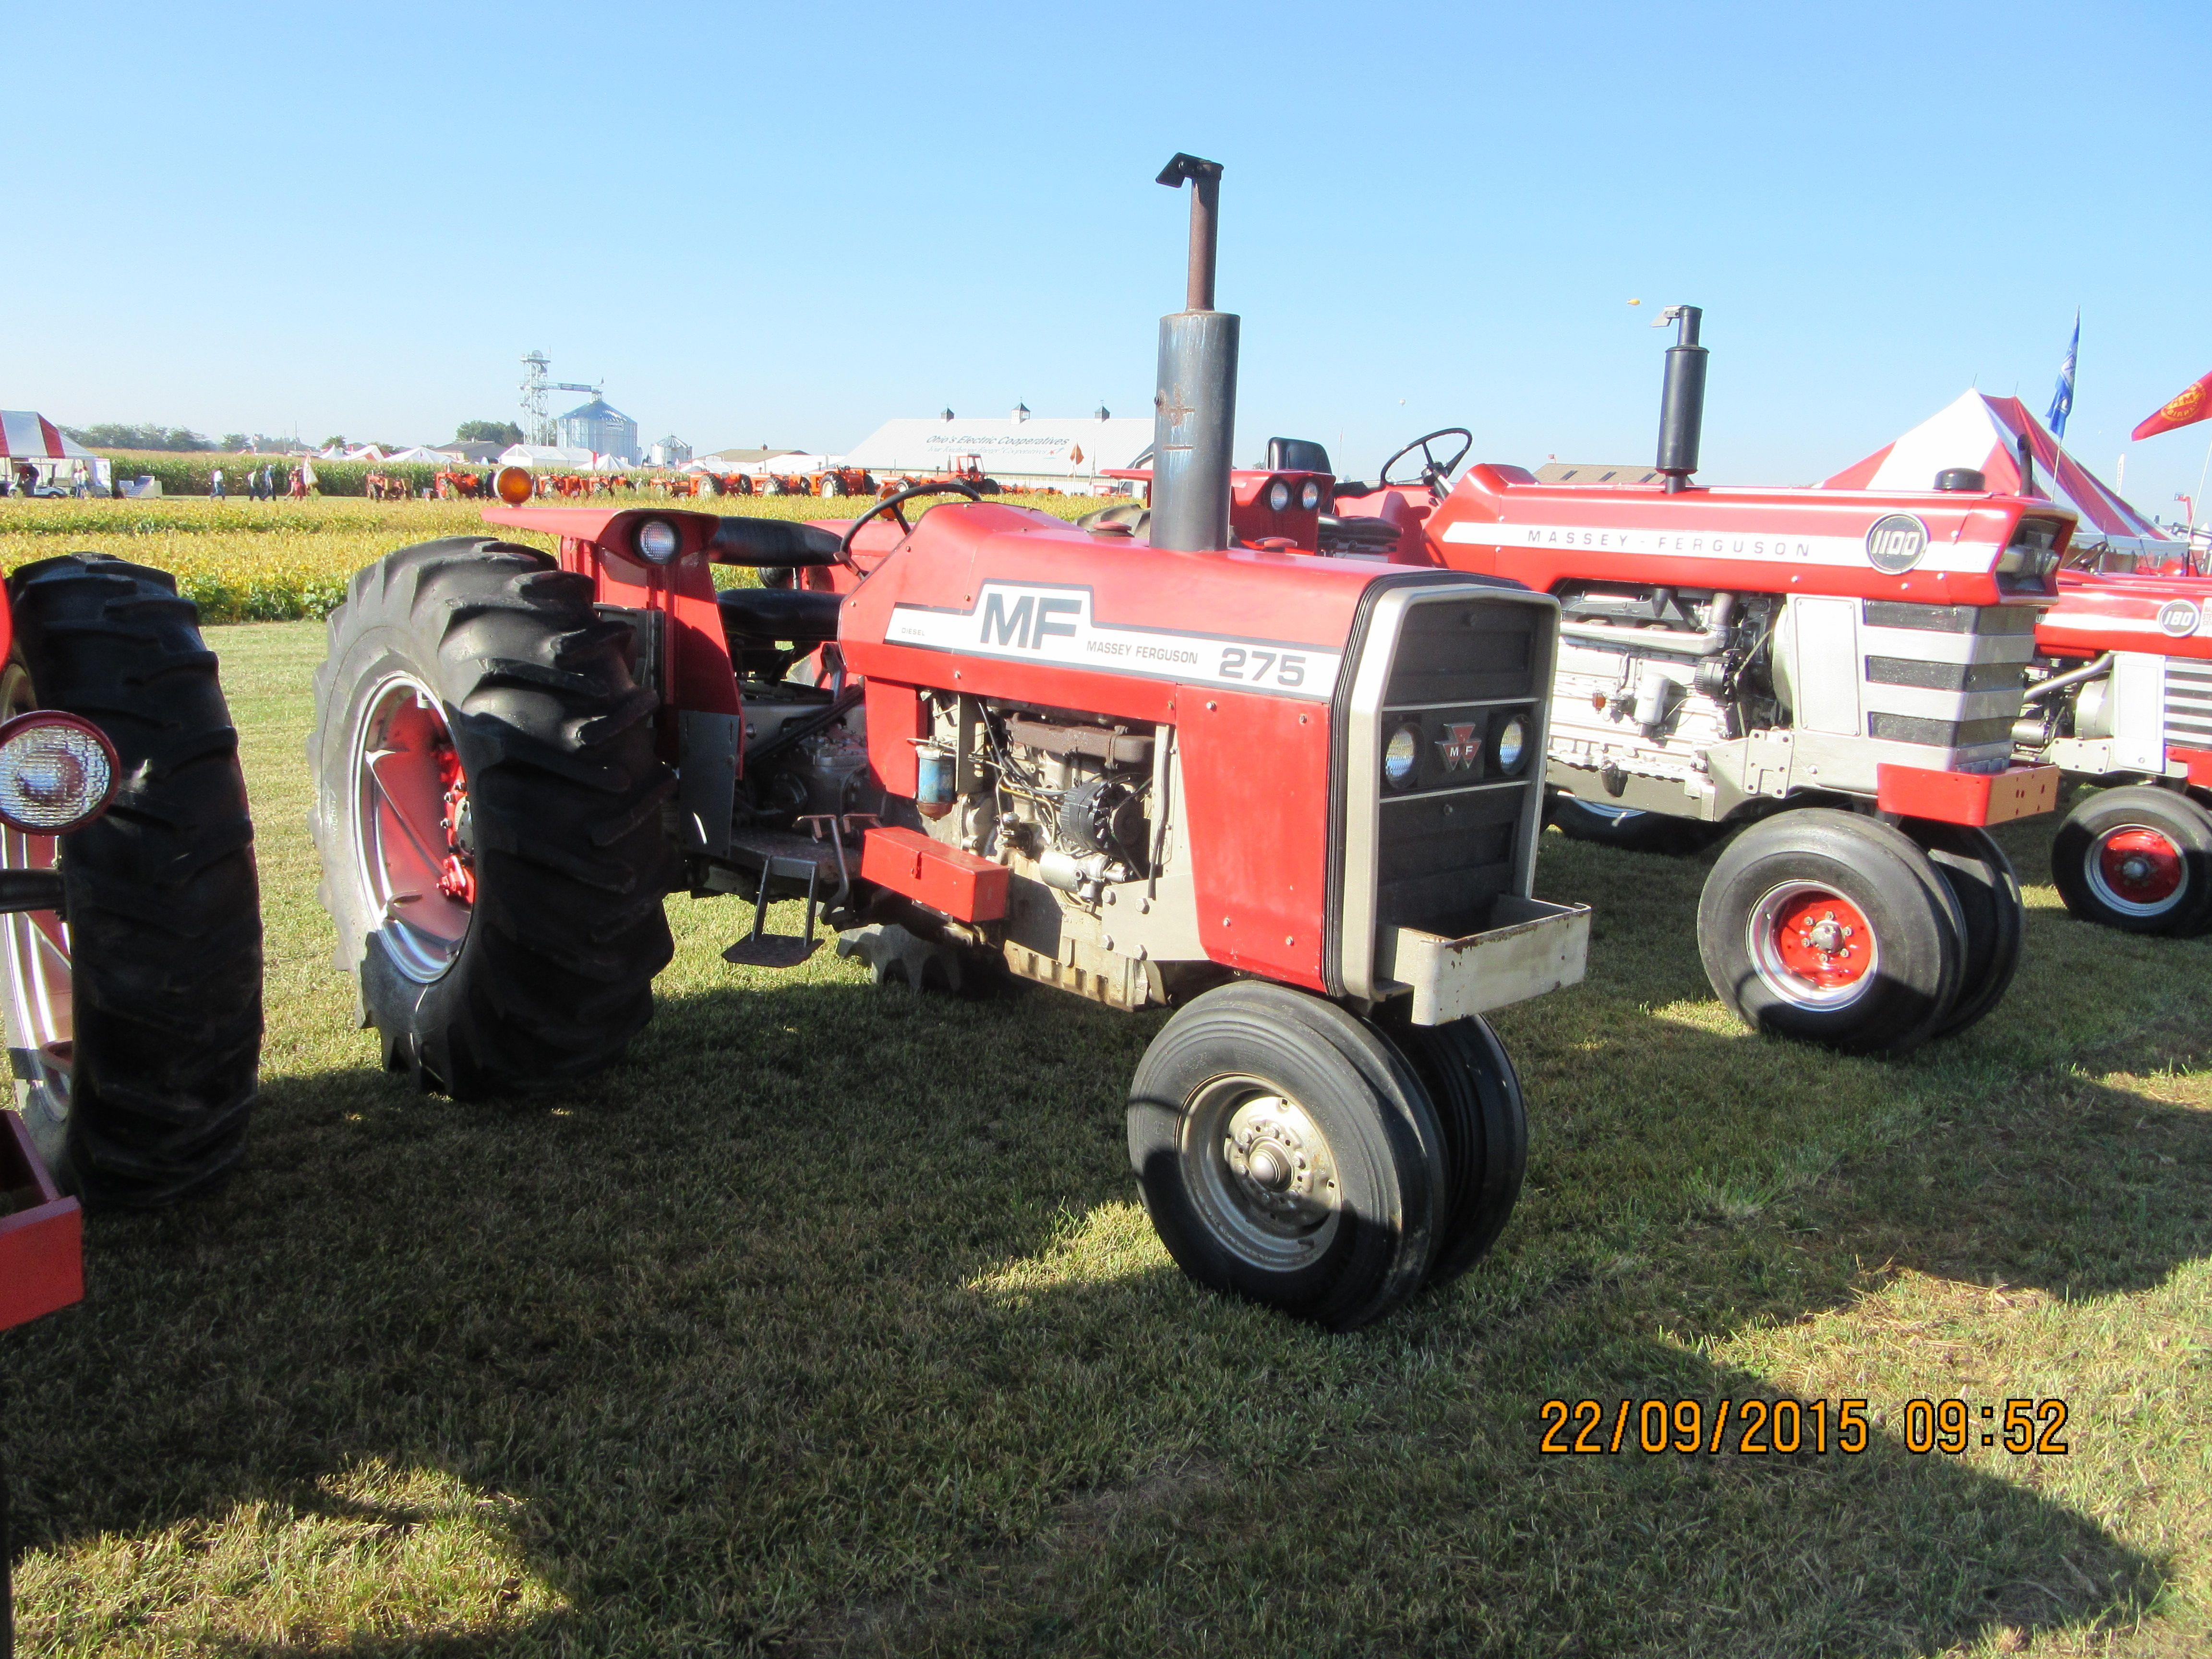 67hp Massey Ferguson 275 Tractors Massey Ferguson Classic Tractor